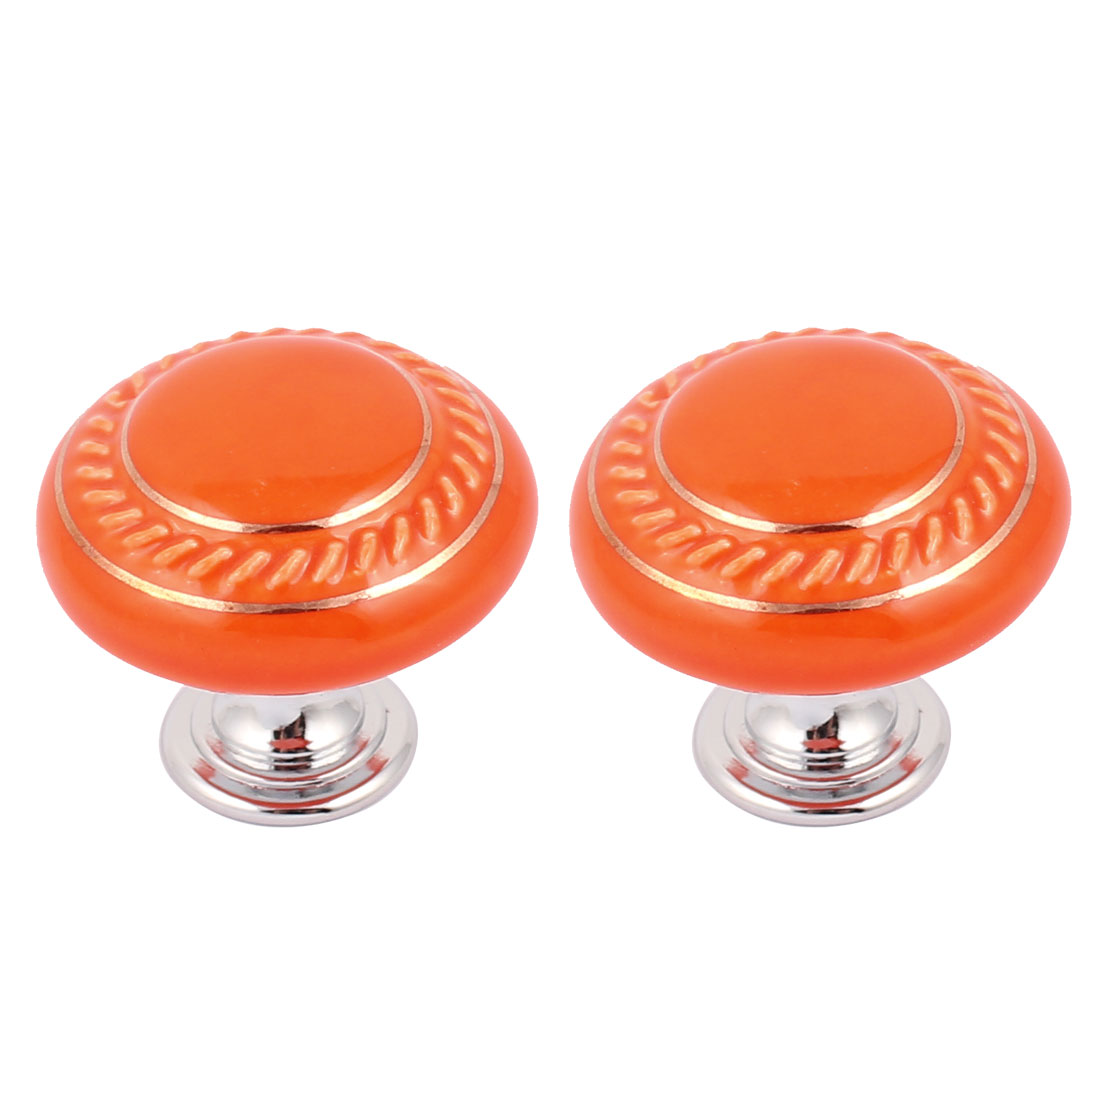 Cabinet Wardrobe Drawer Door Pull Round Shape Ceramic Knobs Handle Orange 2pcs